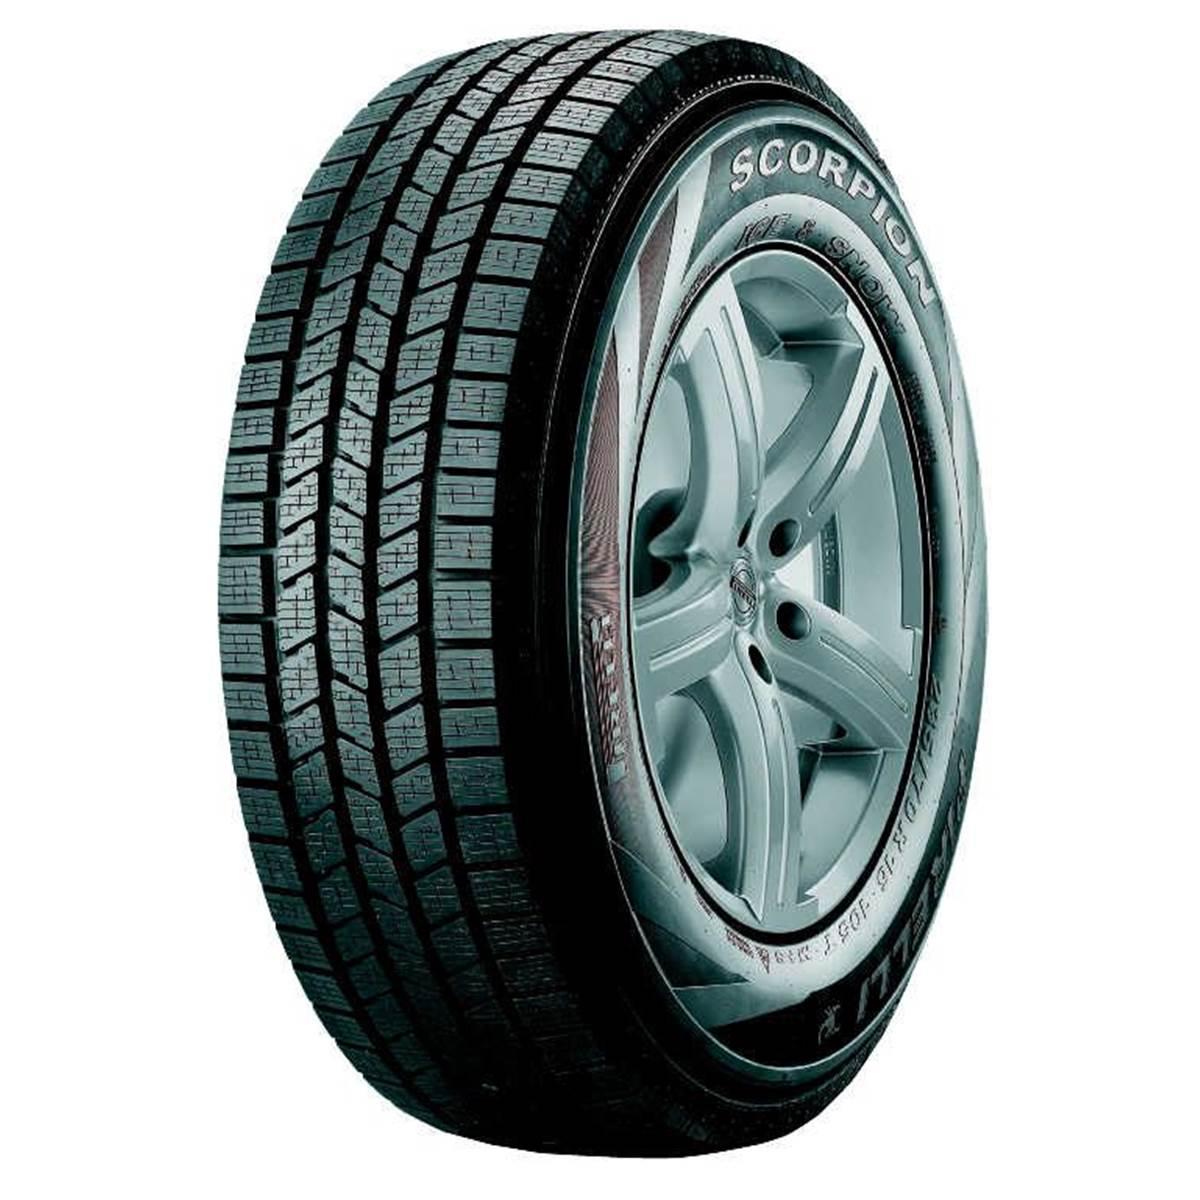 Pneu hiver Pirelli 275/50R20 109H Scorpion Ice & Snow